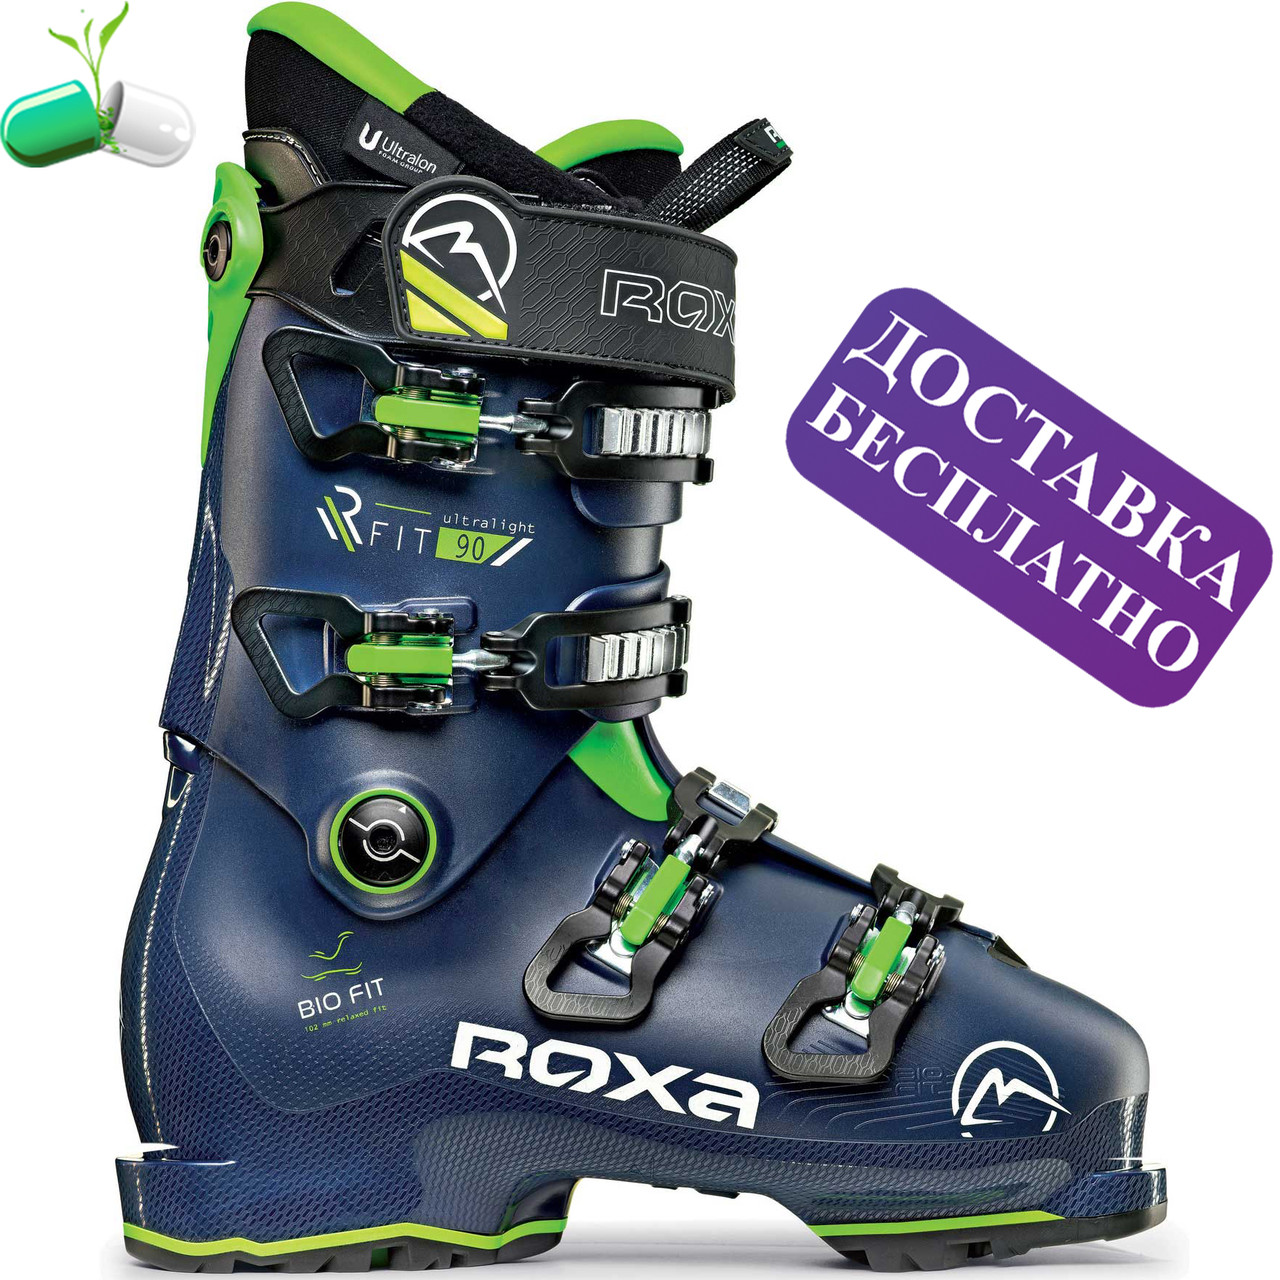 Лижні черевики ROXA RFit 90 (dk blue/dk blue/green)